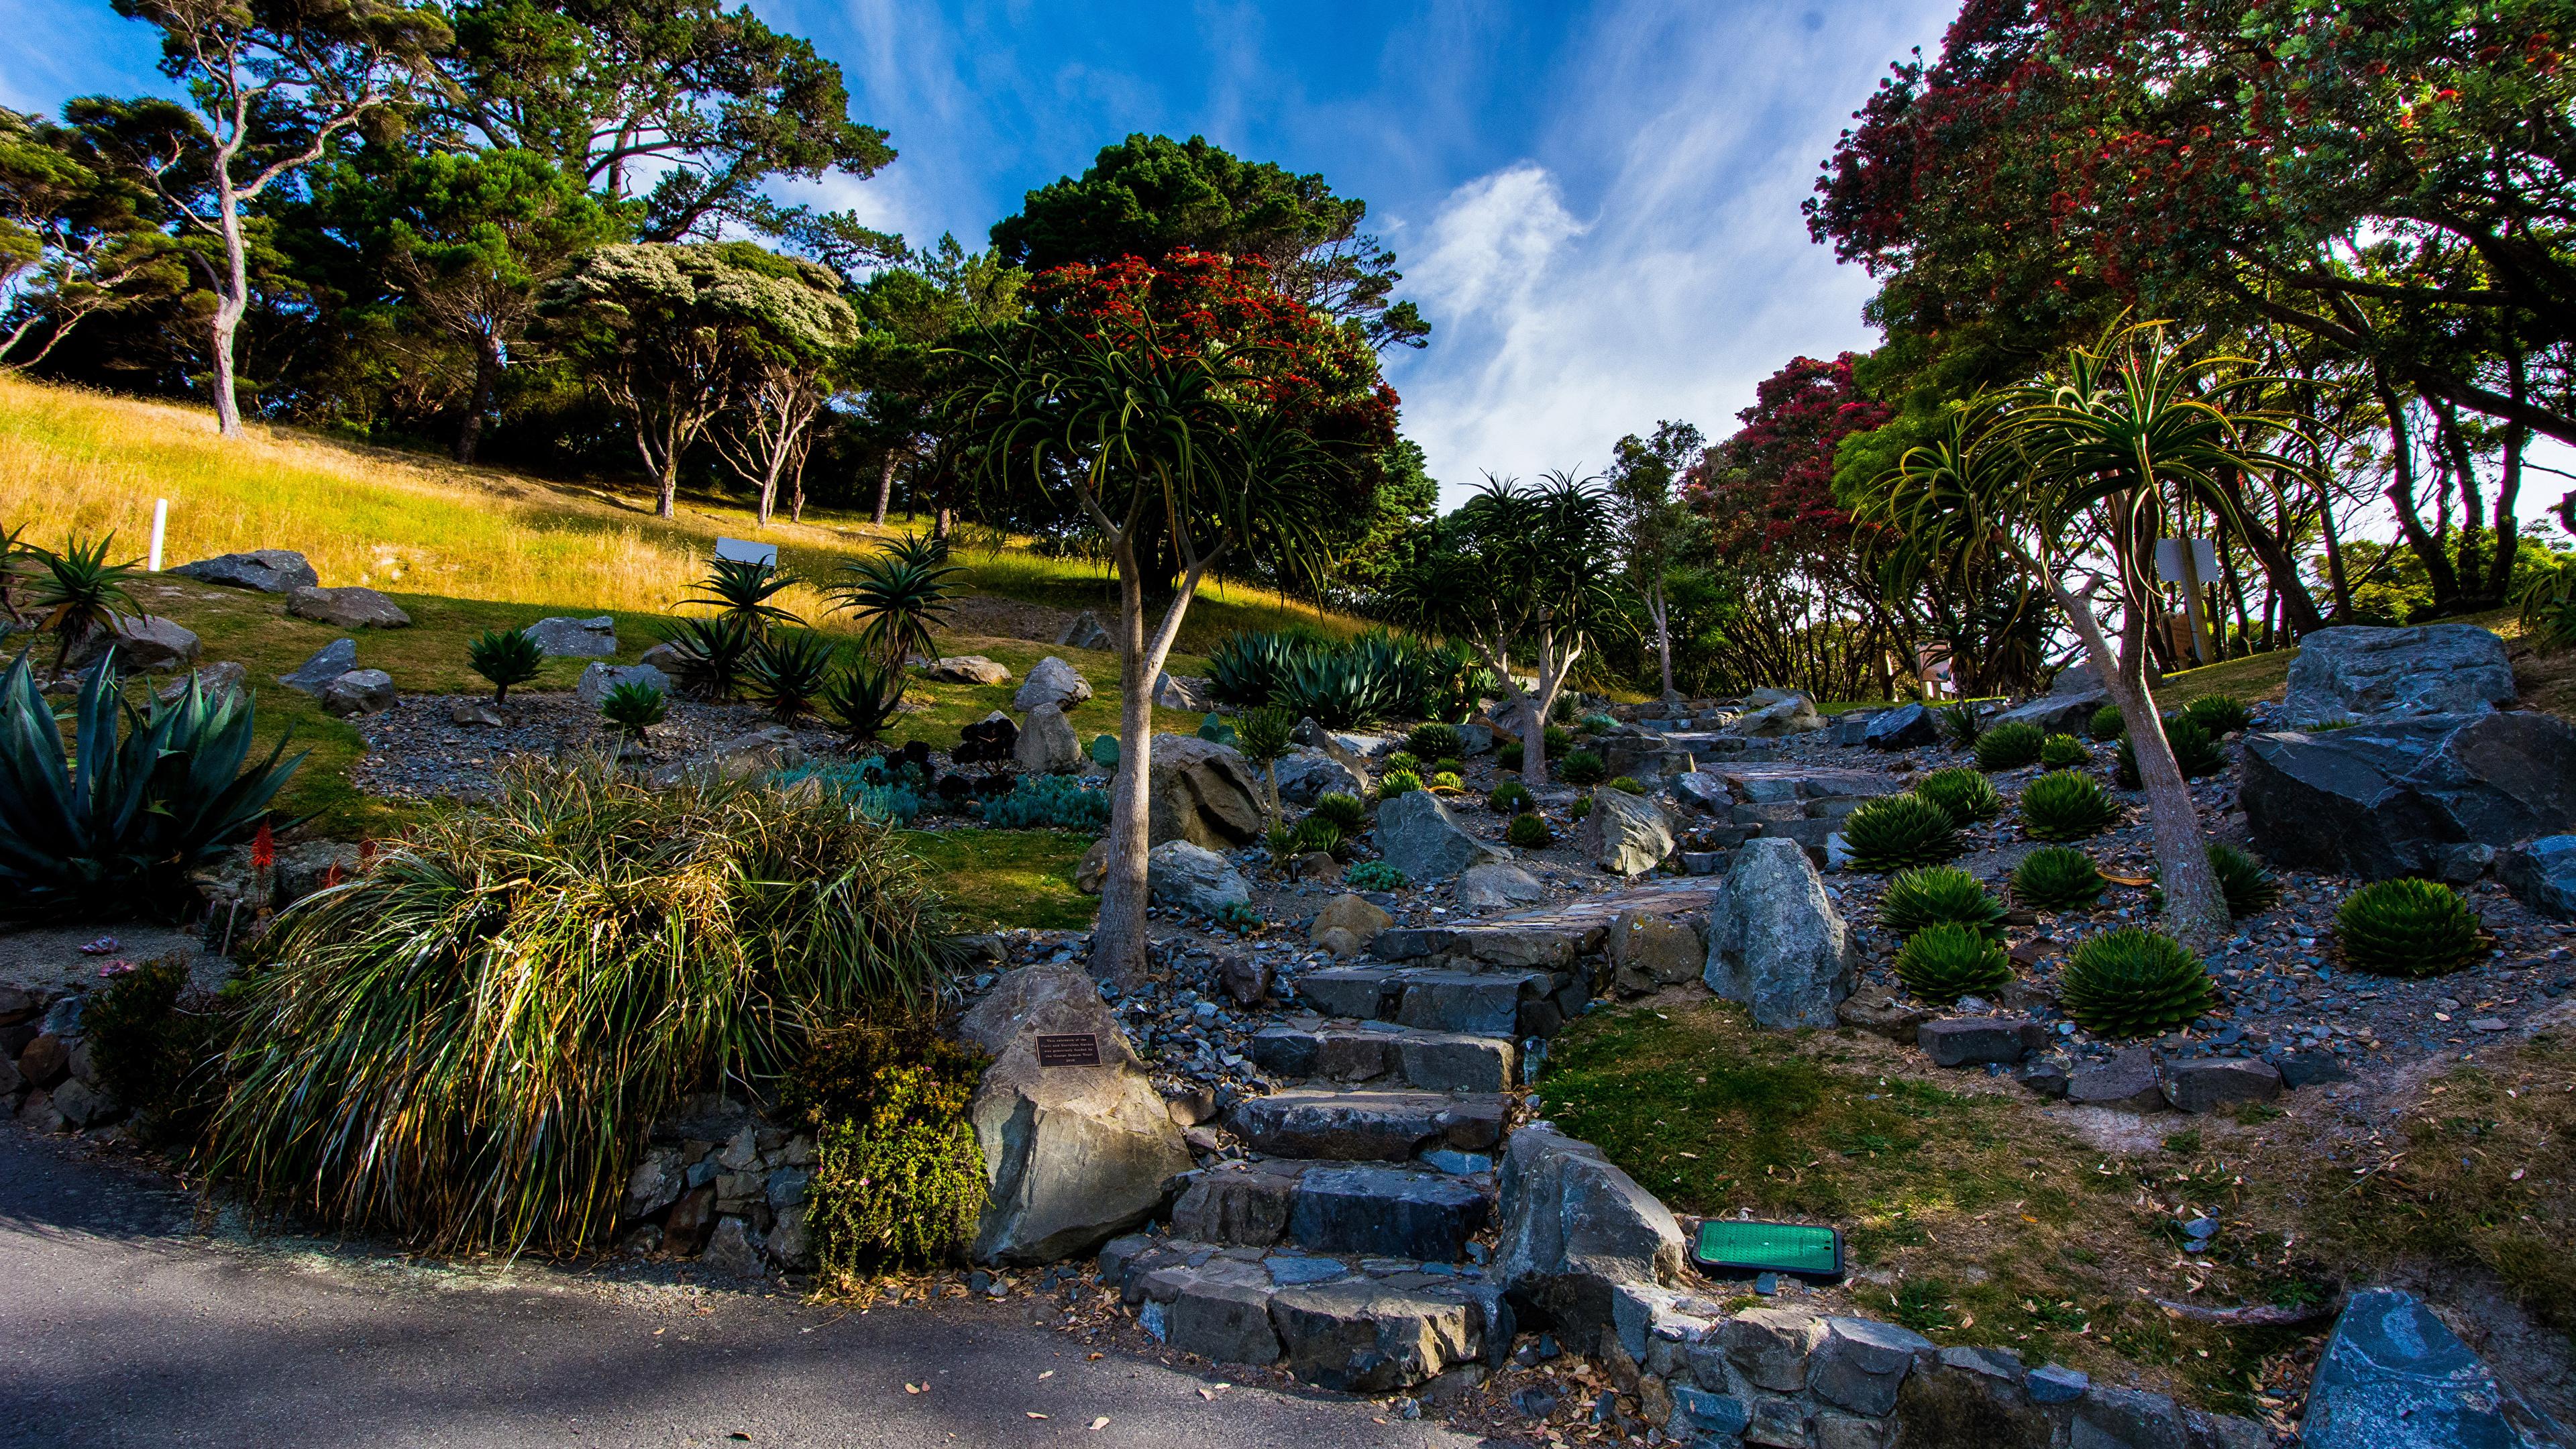 Images New Zealand Wellington Botanical garden Nature 3840x2160 3840x2160